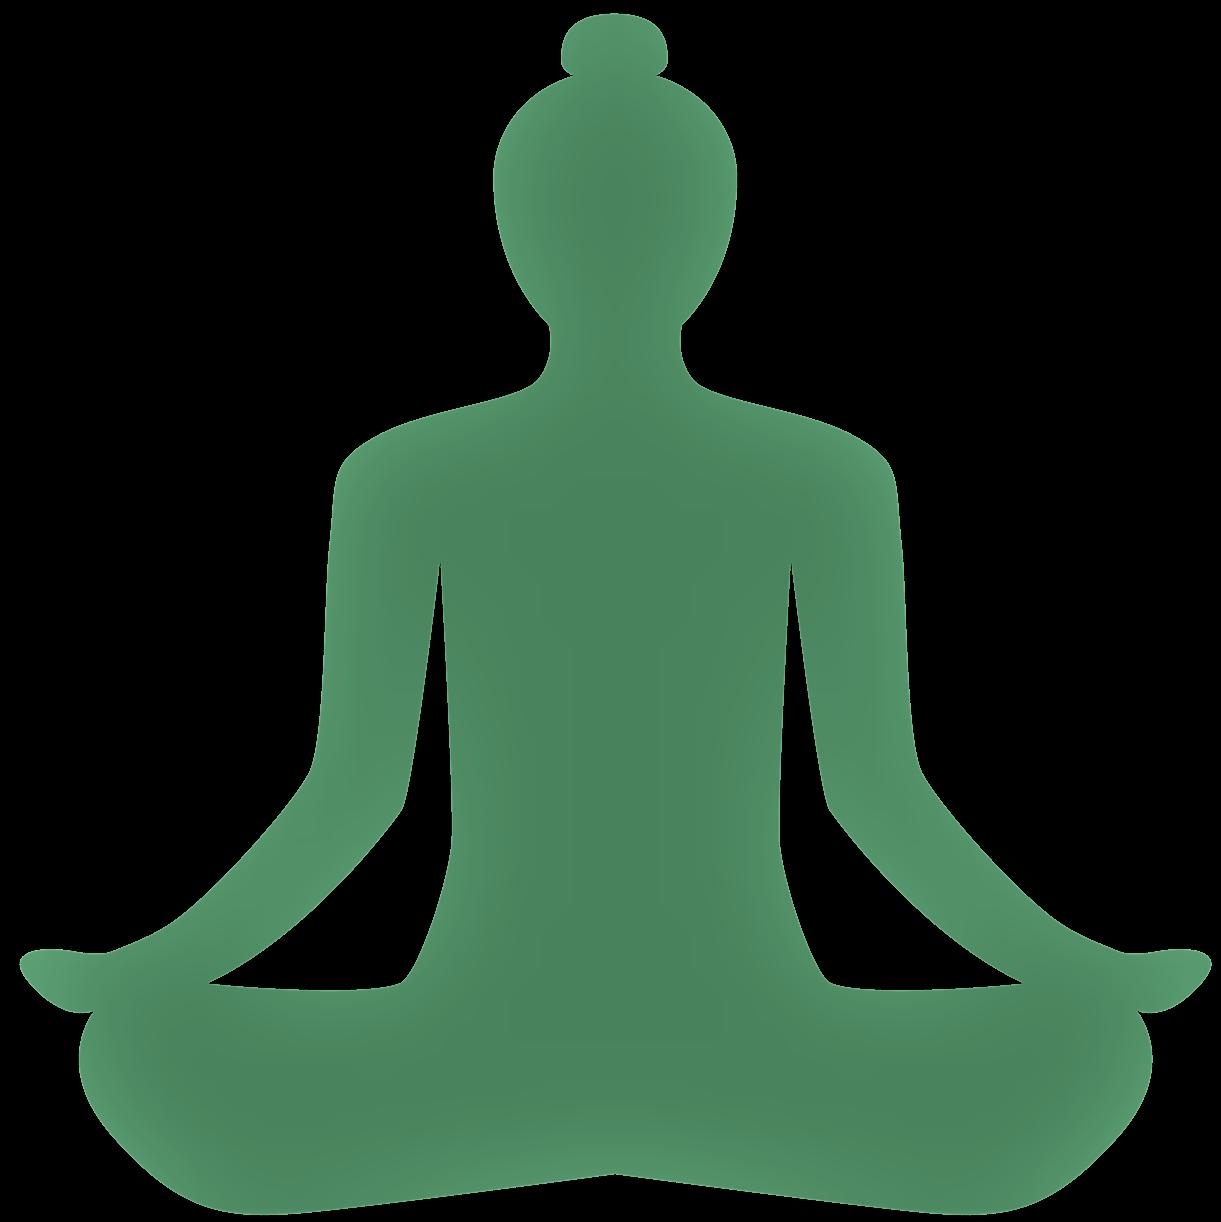 Meditation clipart gassho, Meditation gassho Transparent ...